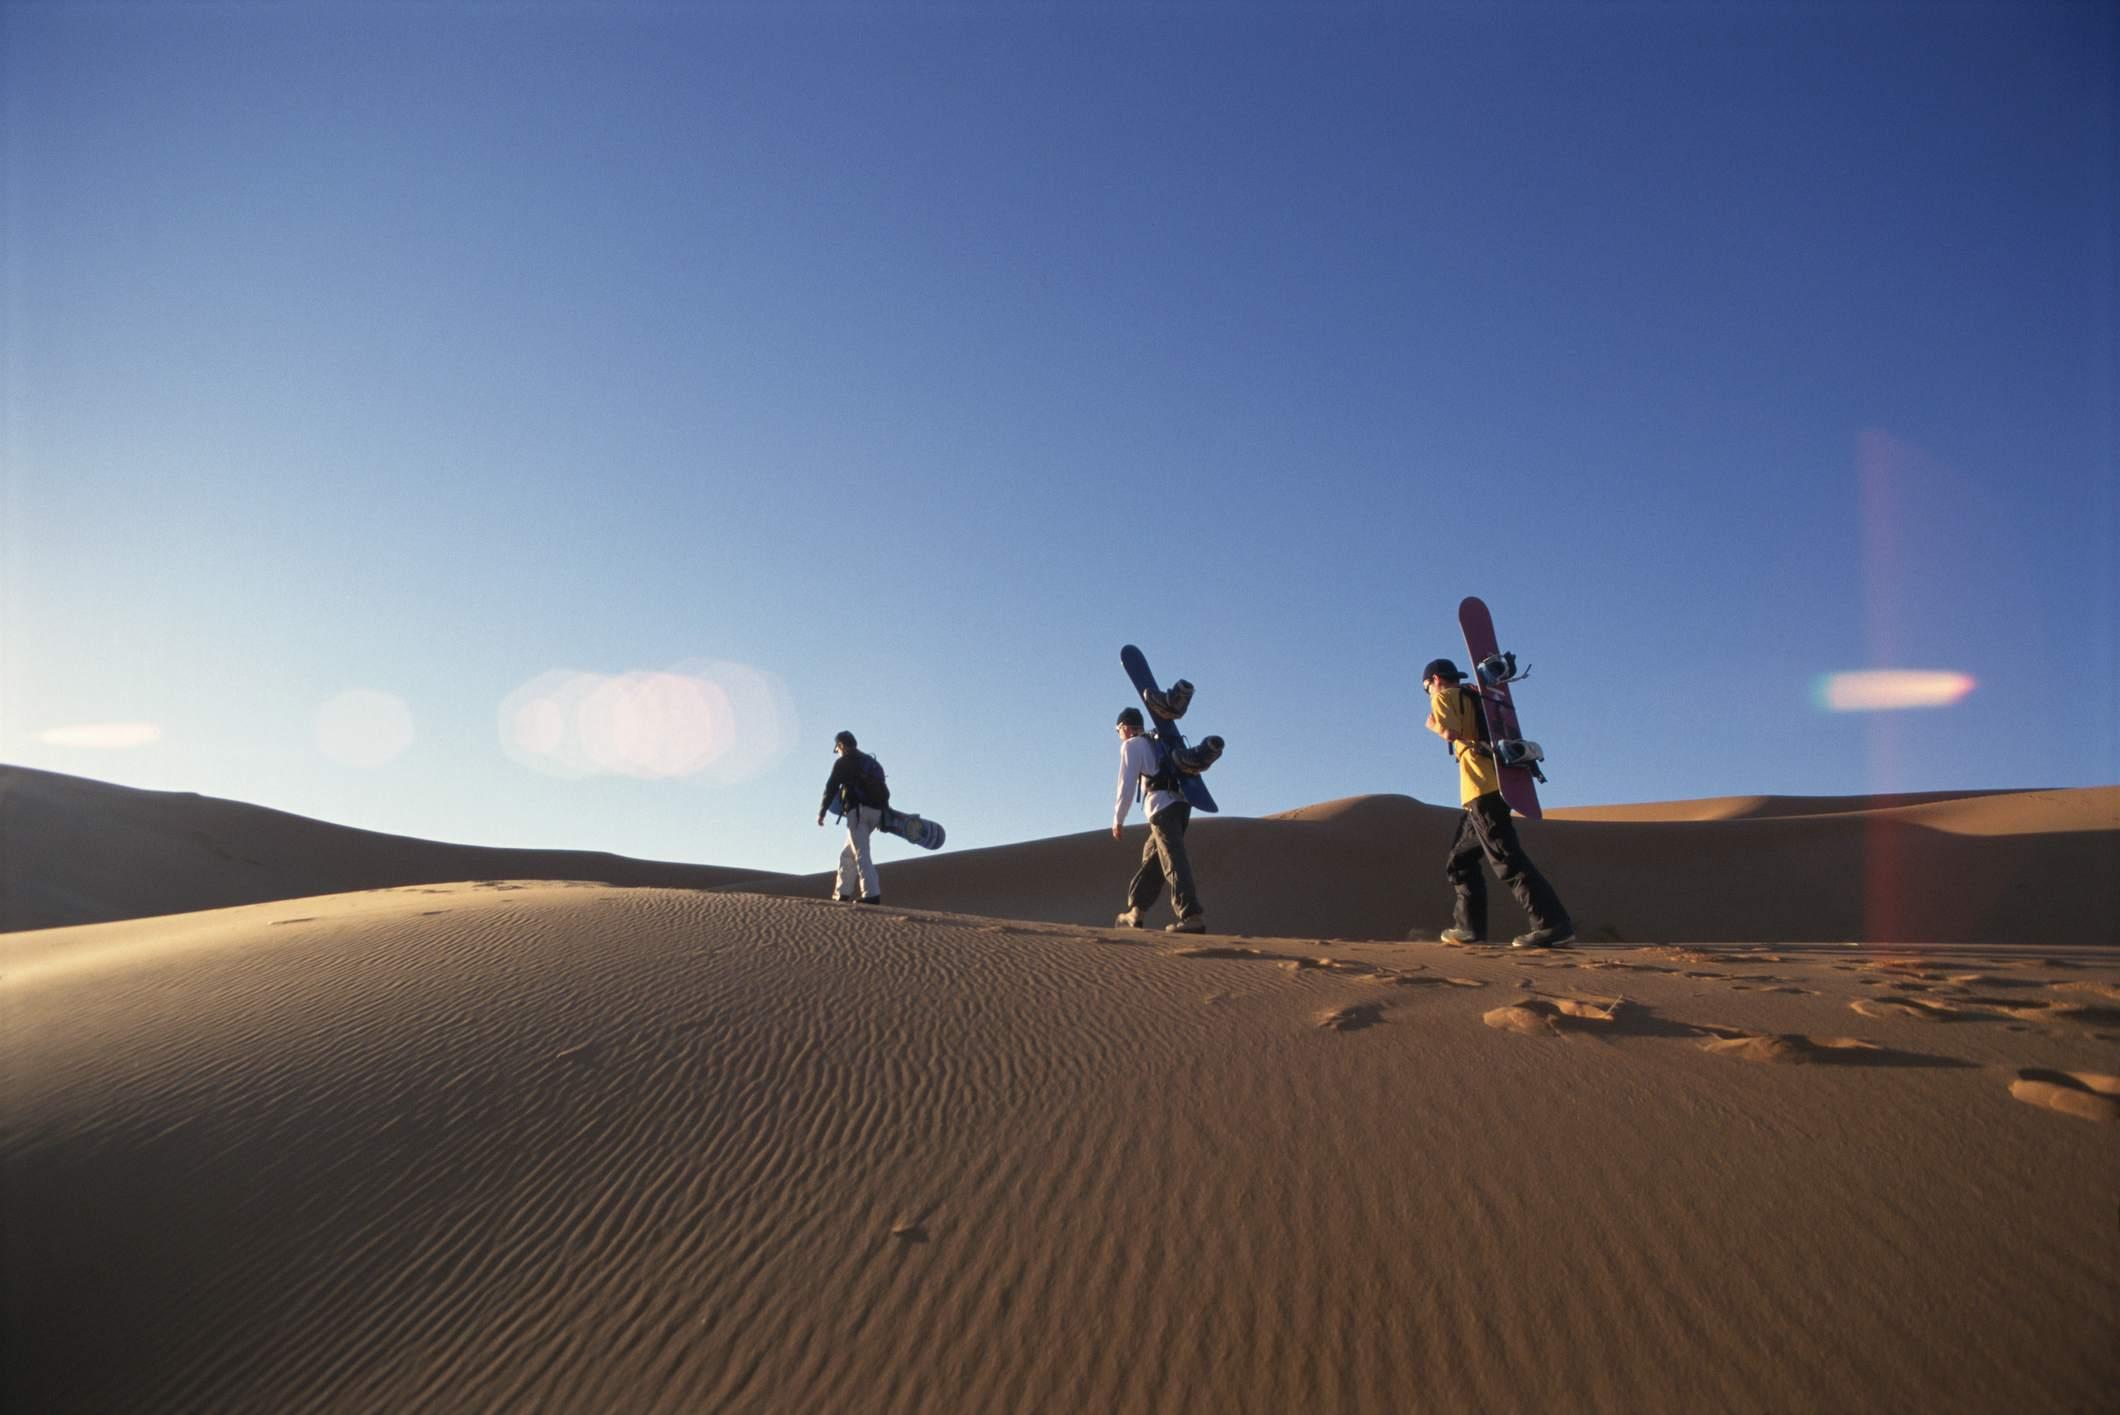 Sand-boarding in the Sahara